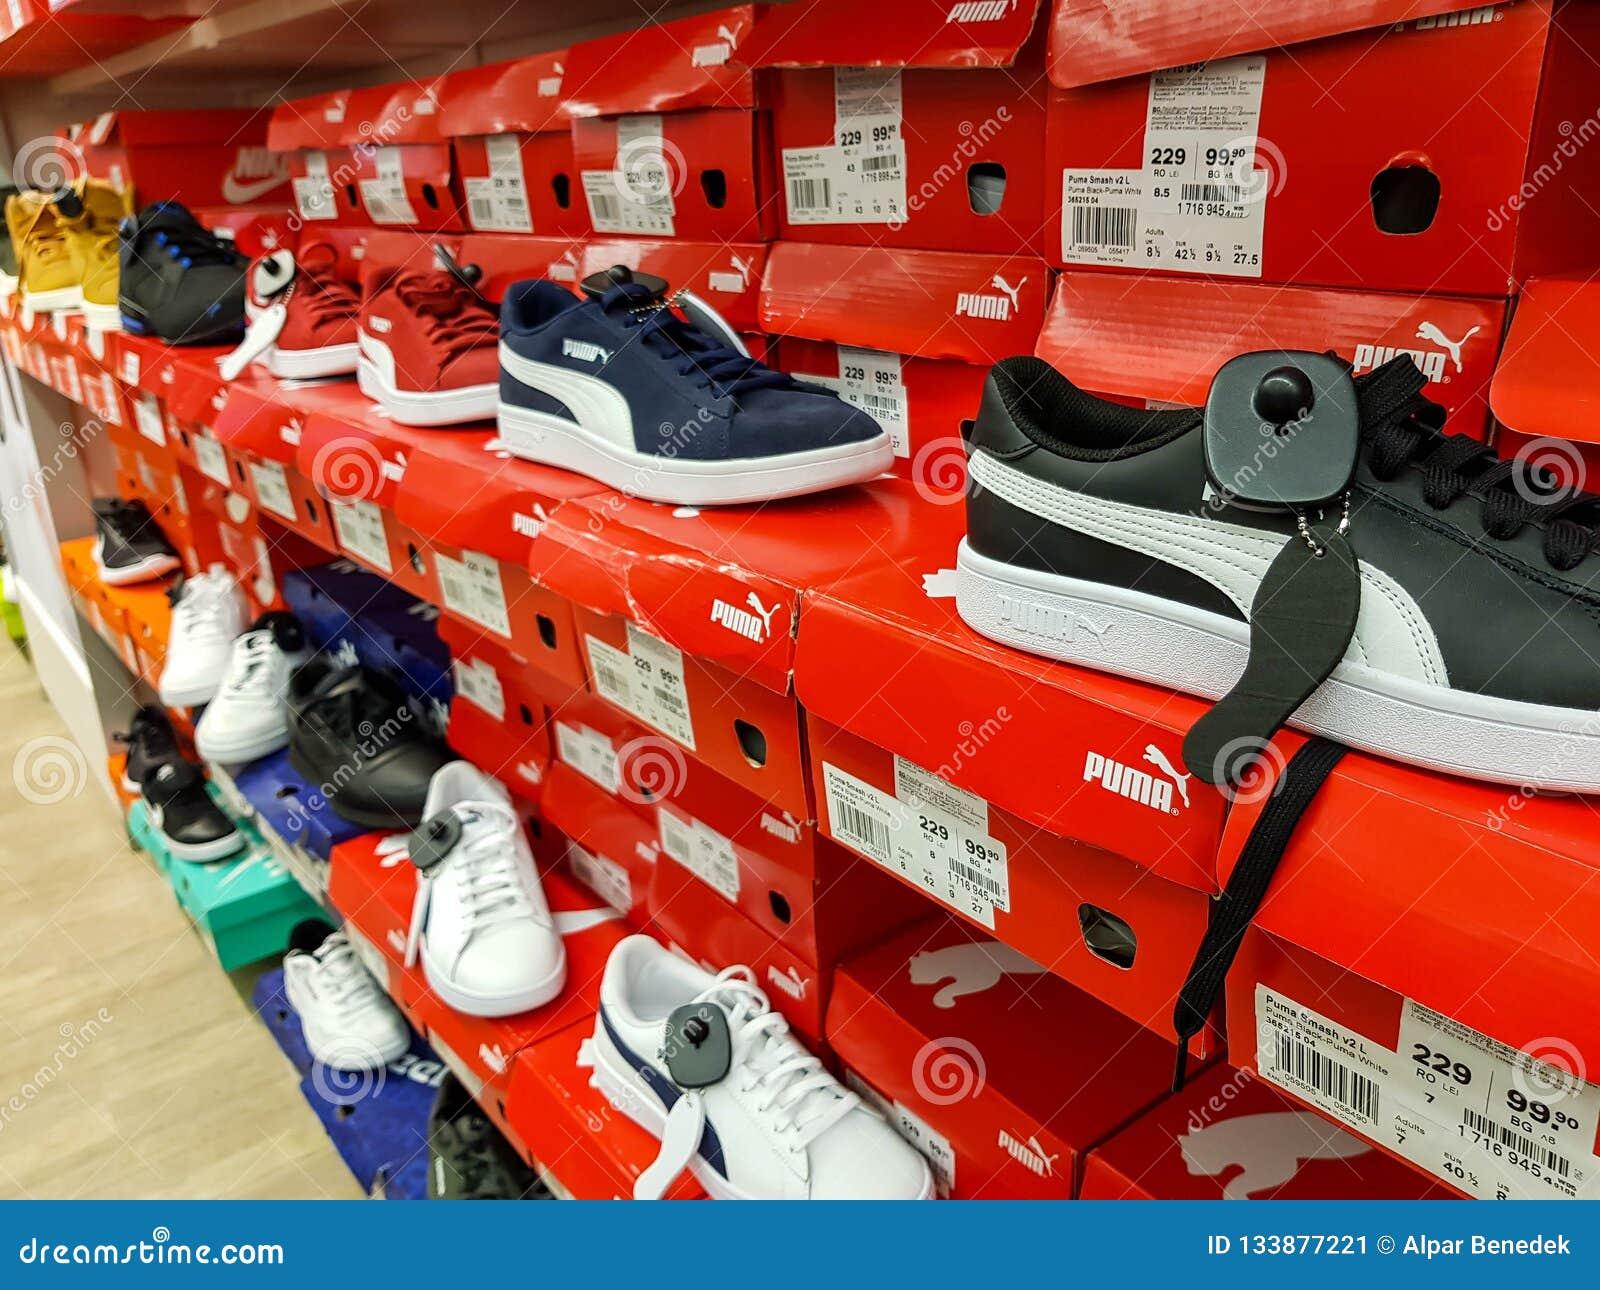 Puma Socks In Local Shoe Store f0f392edb48a